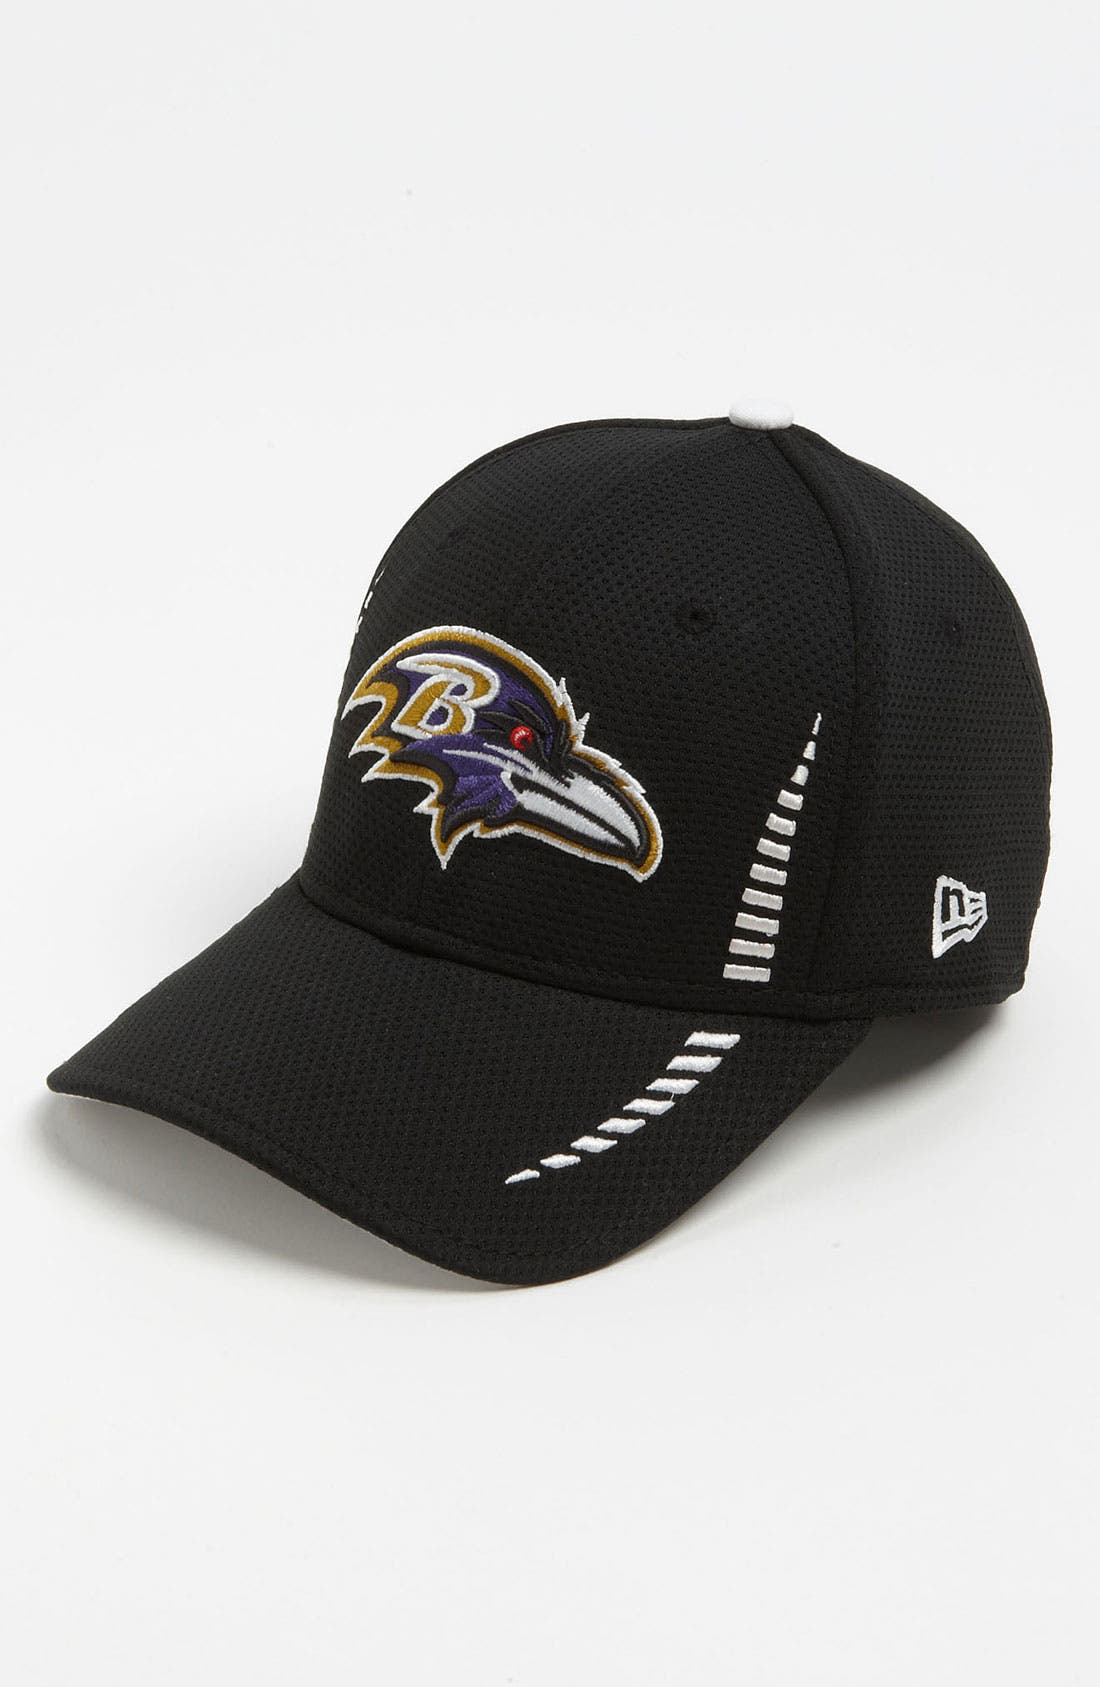 Main Image - New Era Cap 'Training Camp - Baltimore Ravens' Baseball Cap